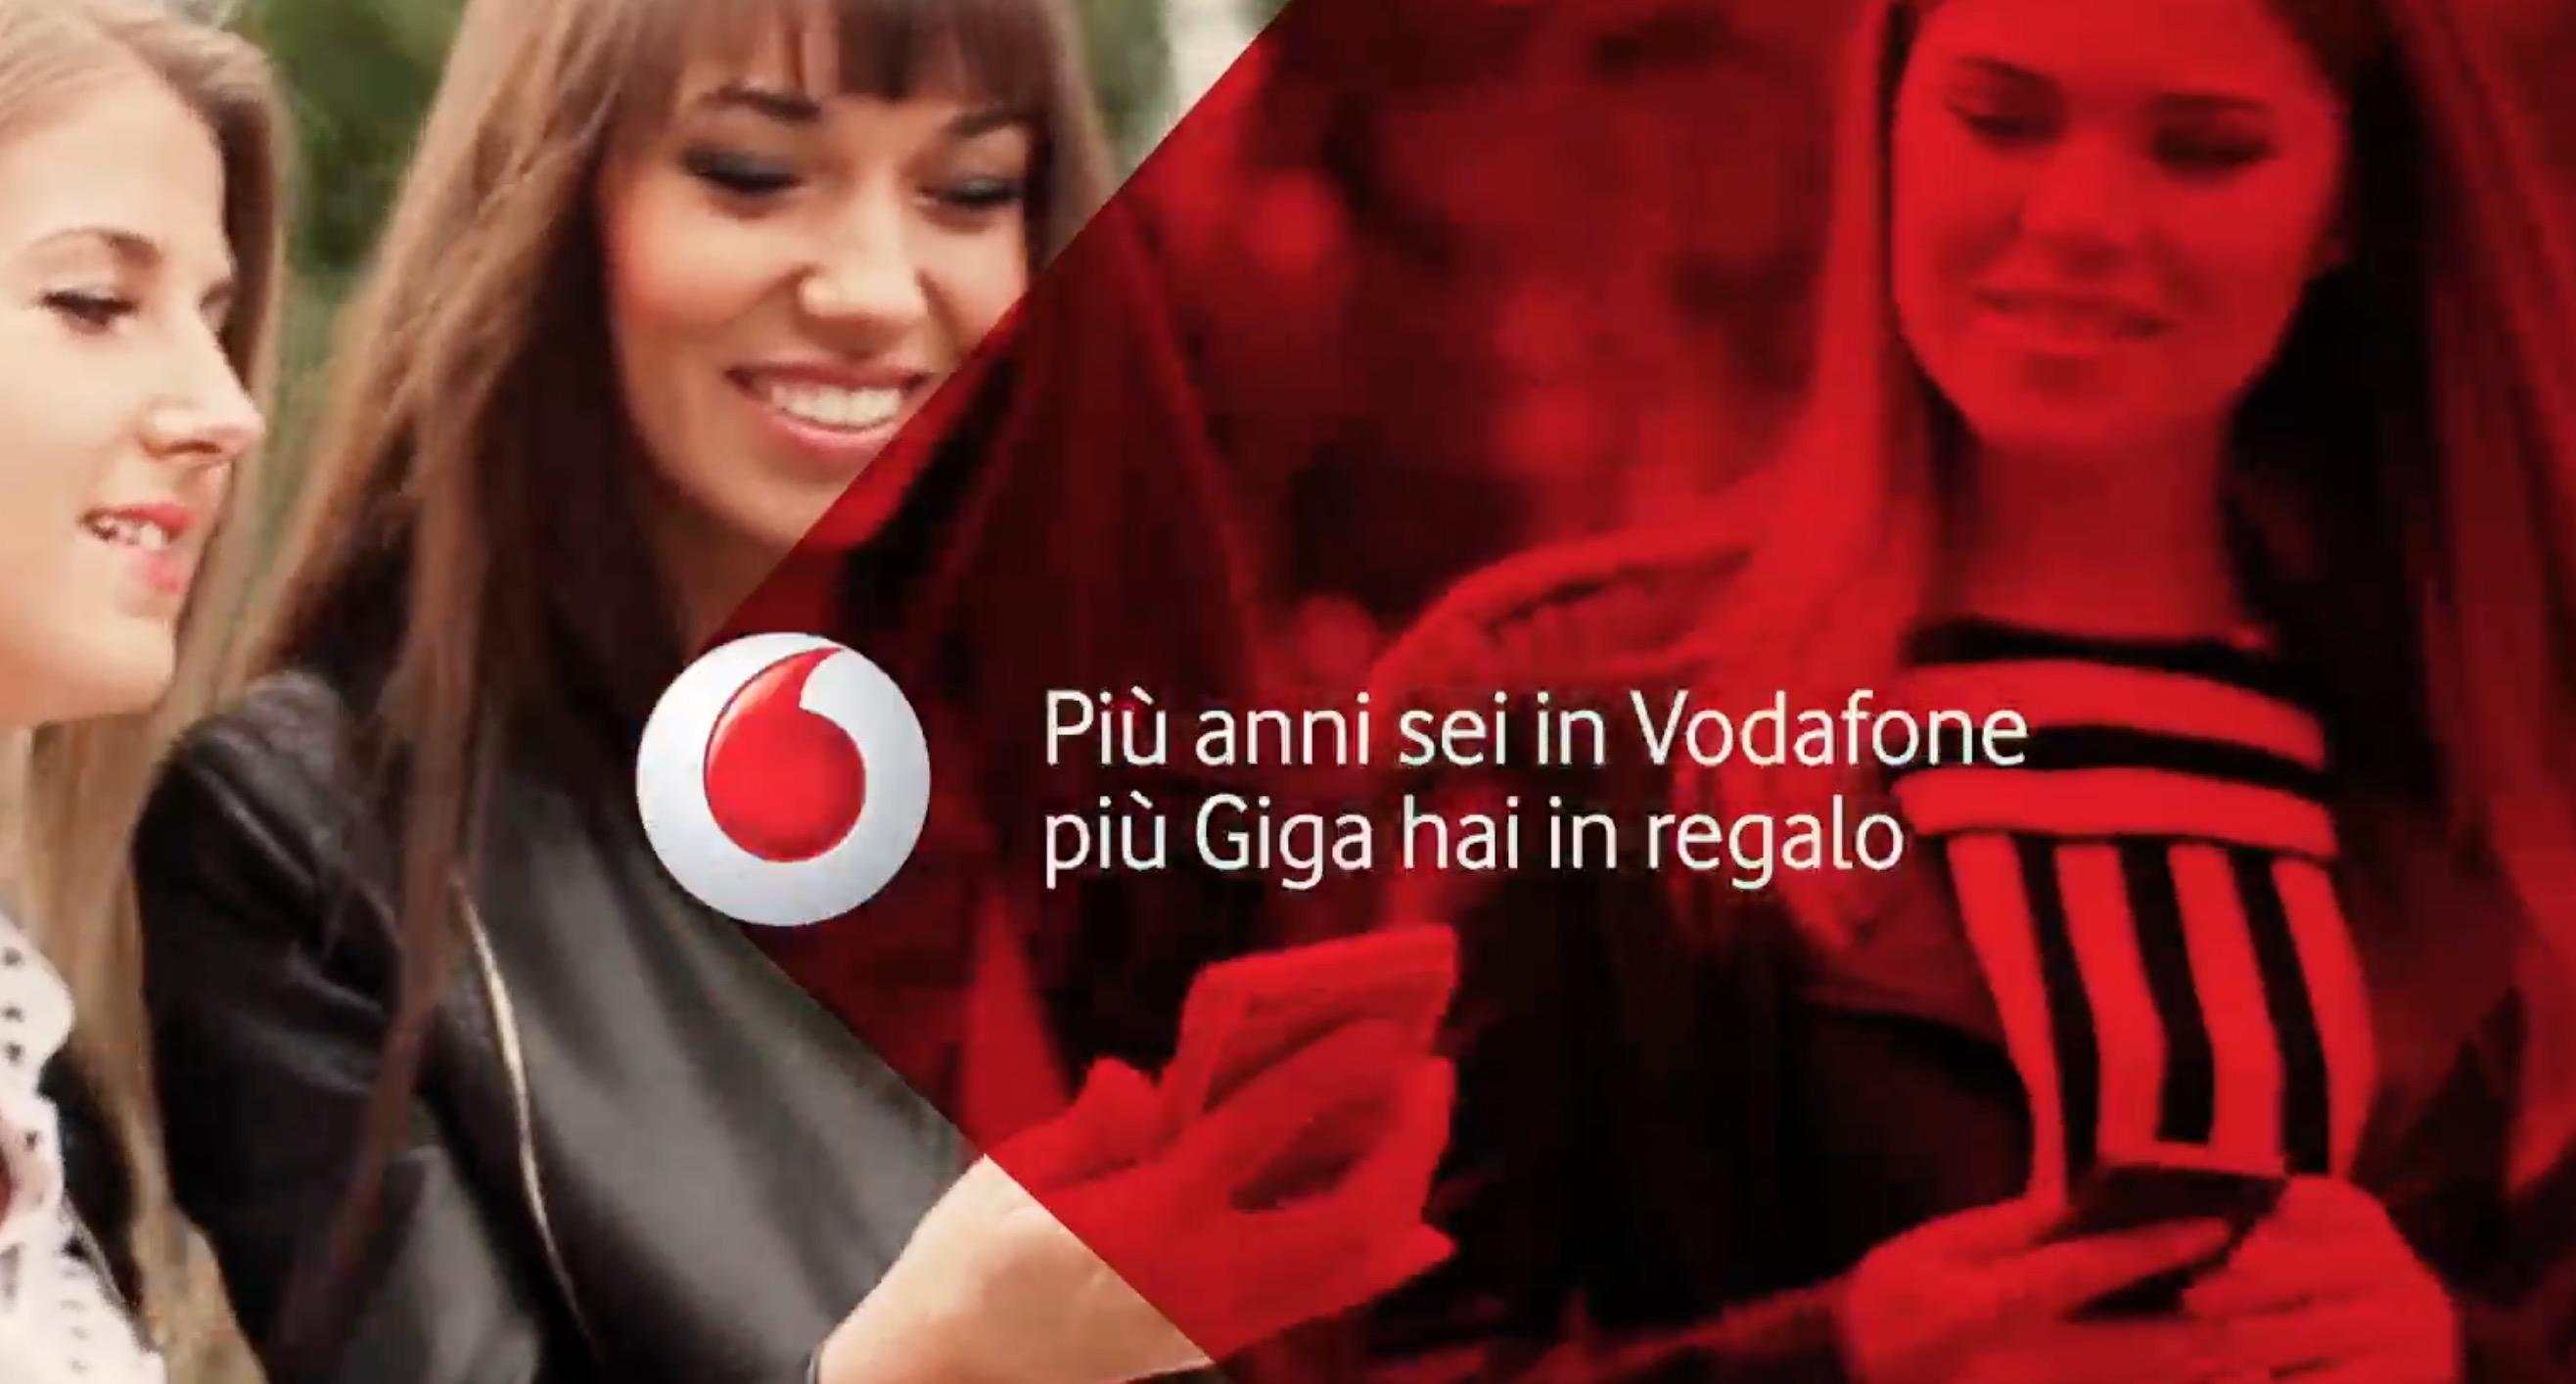 Vodafone Giga4You regala fino a 10 GB di Internet ai clienti